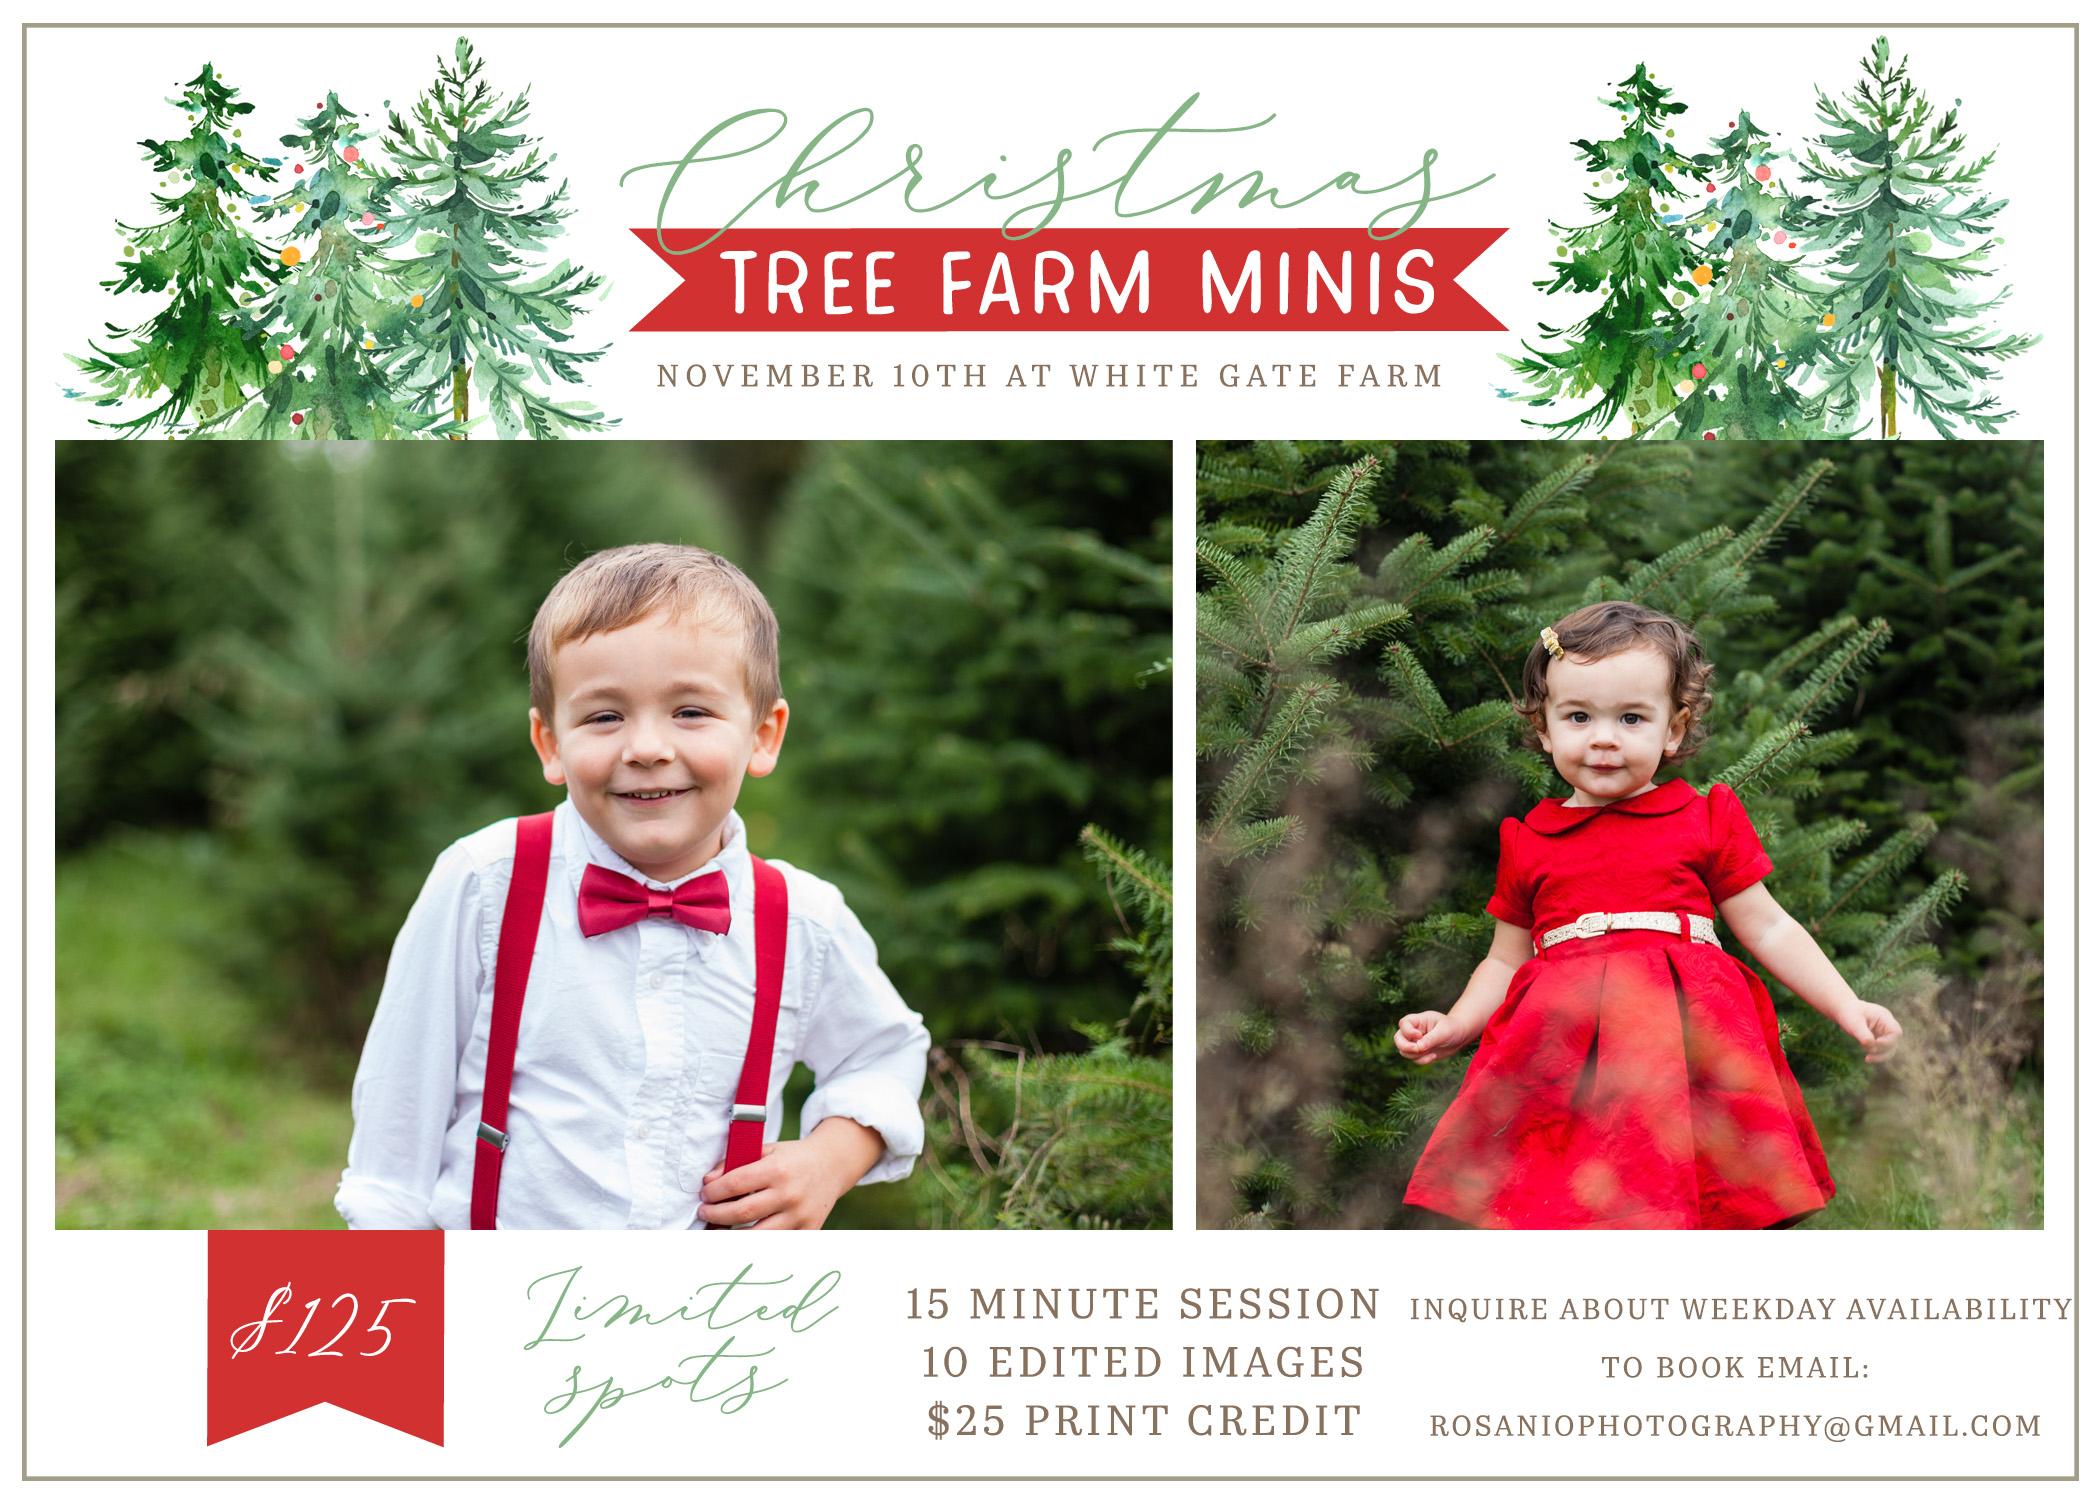 Christmas Tree Farm Mini Session Massachusetts Photographer.jpg